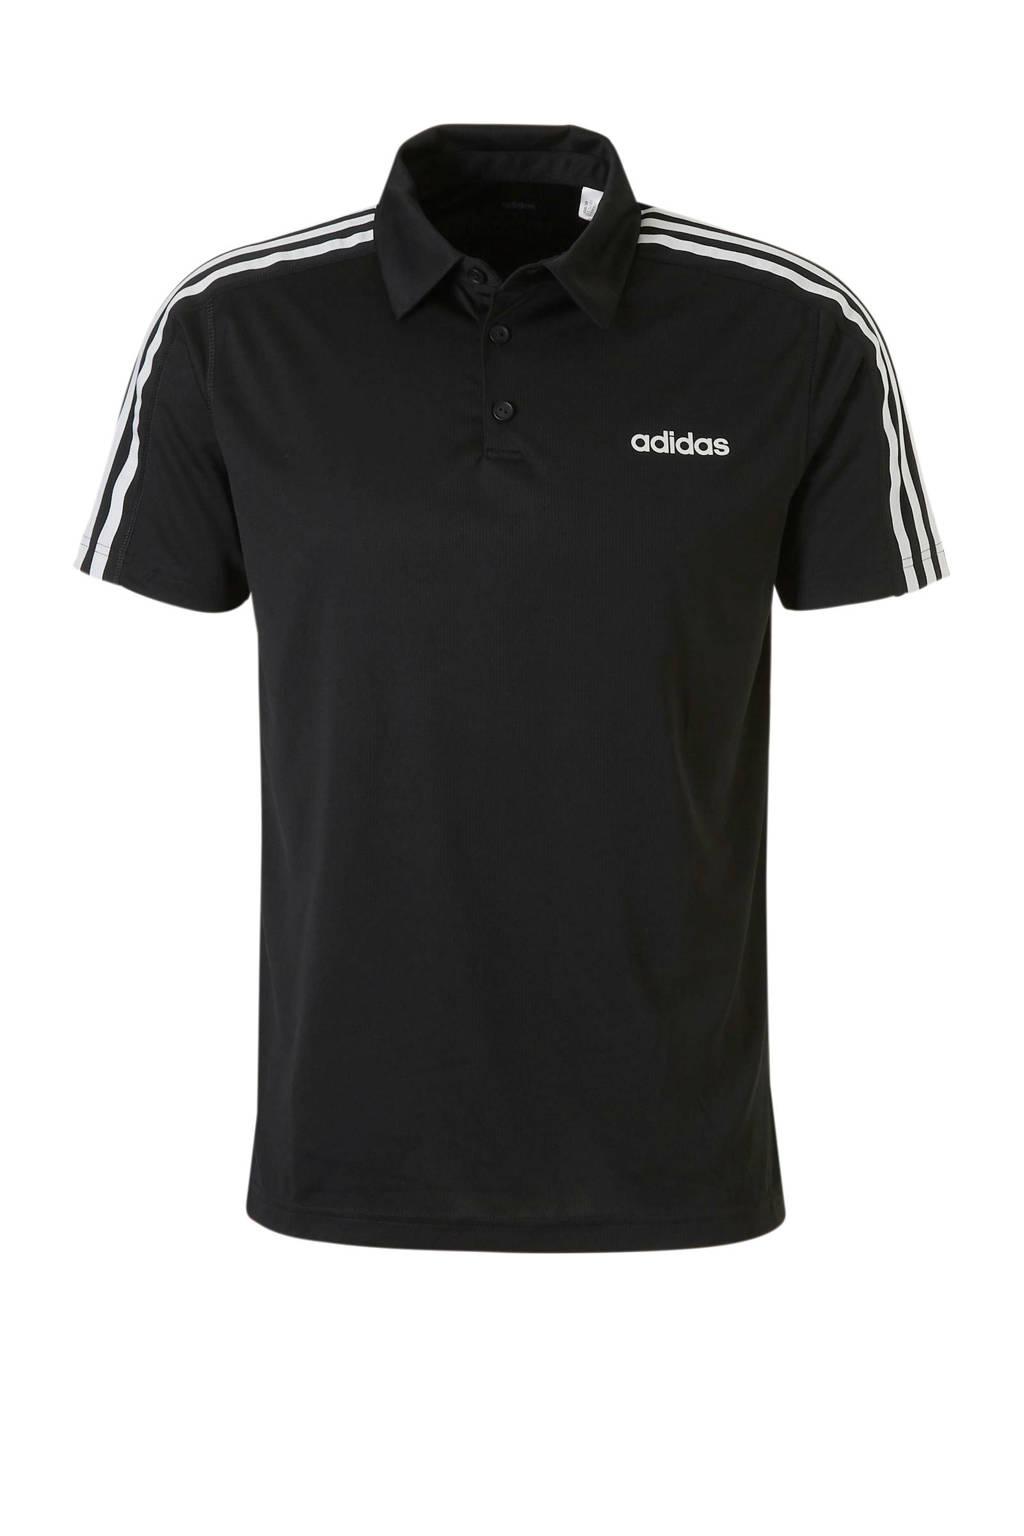 adidas   sportpolo zwart, Zwart